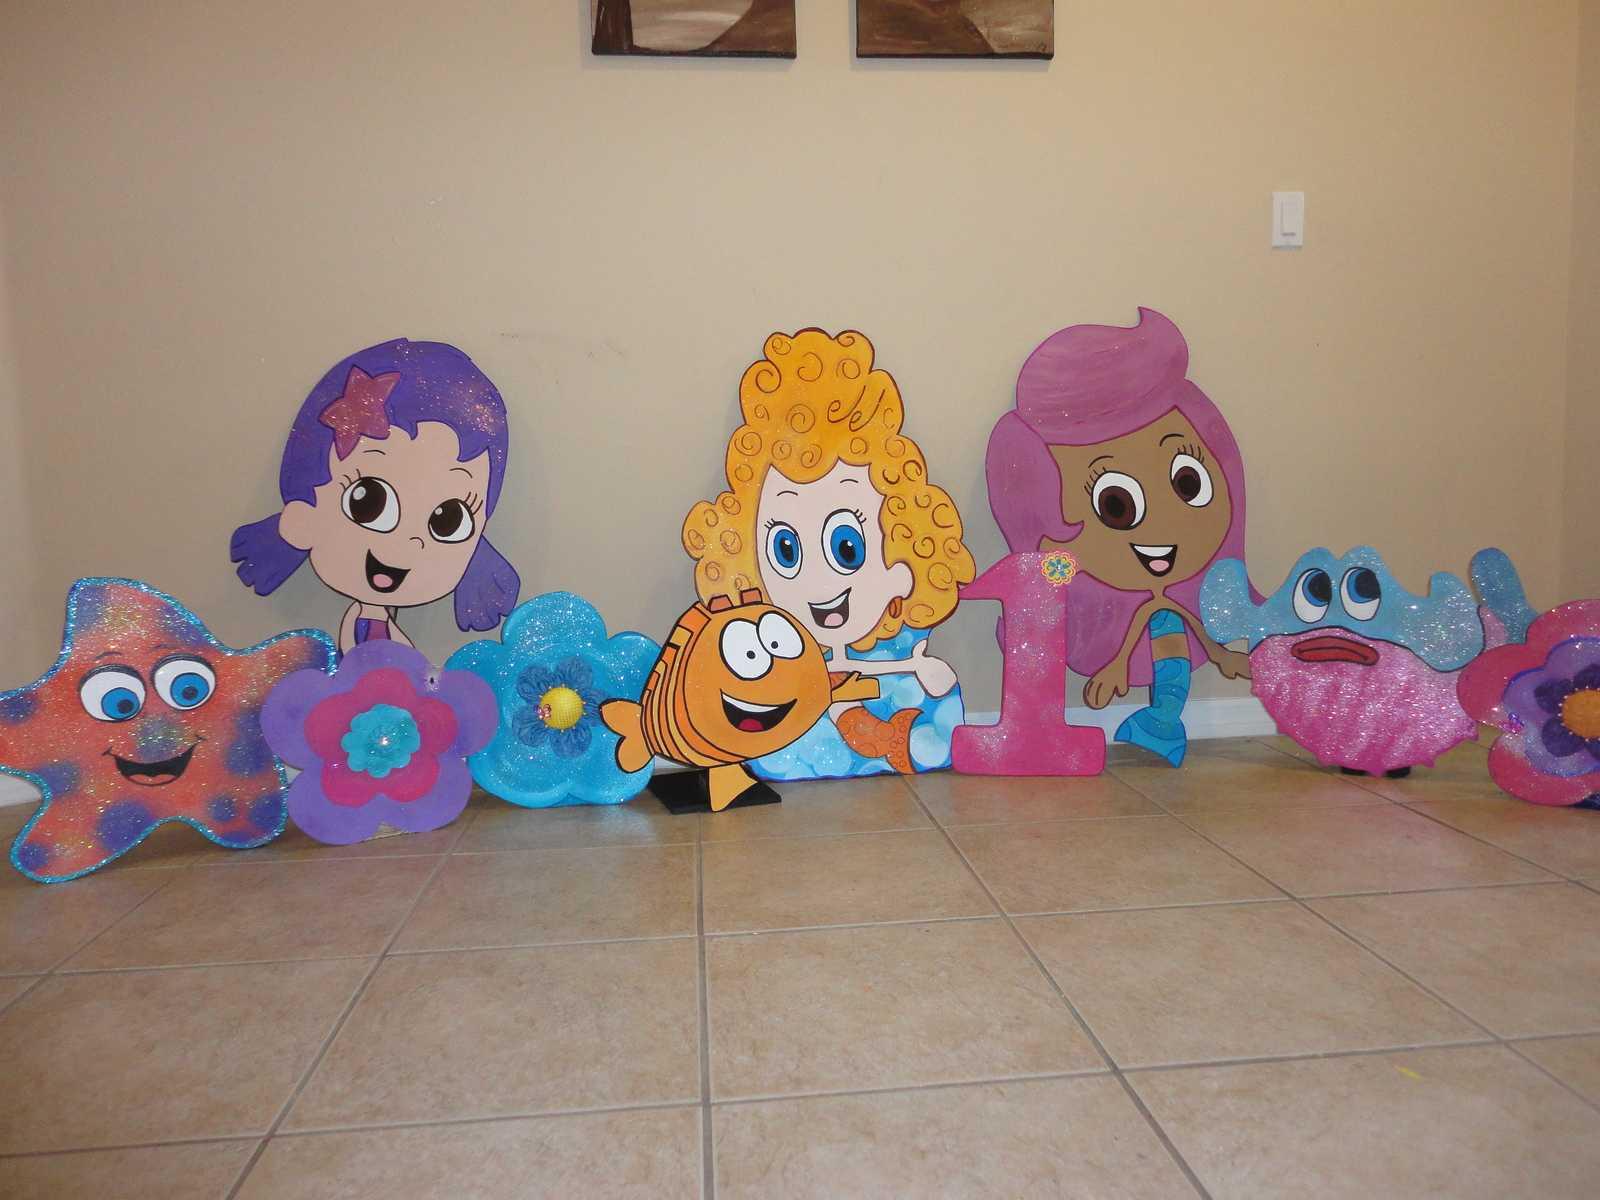 Bubble Guppies Birthday Decorations   Bob Doyle Home With Regard To Bubble Guppies Birthday Banner Template